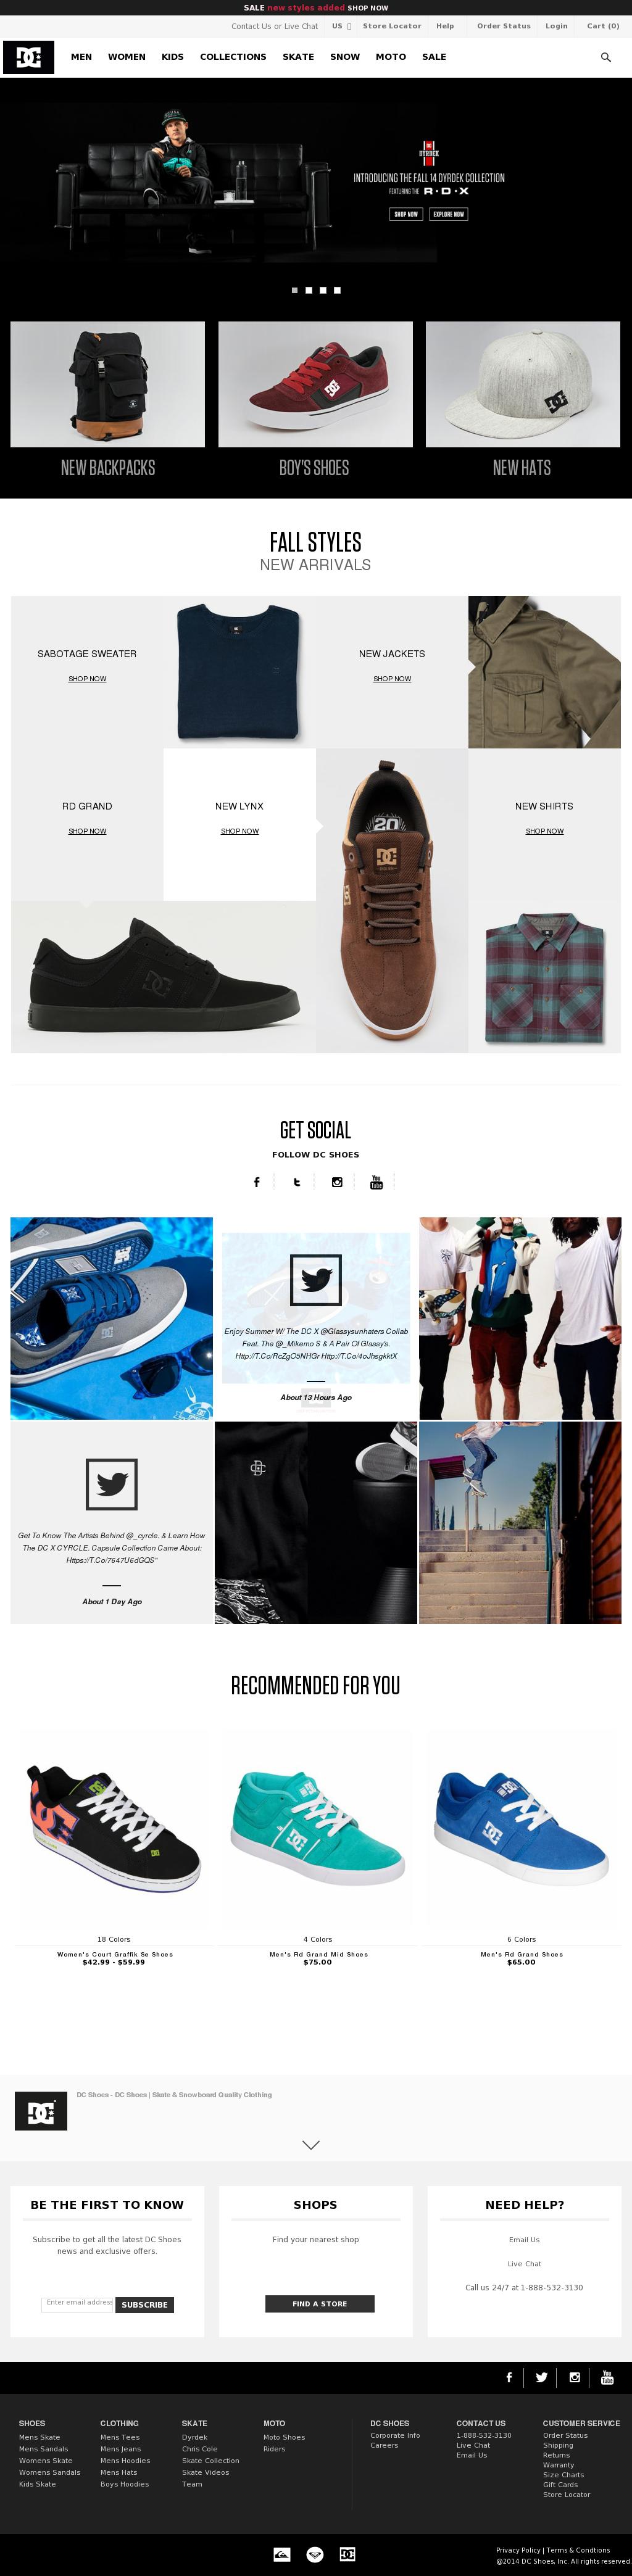 9063fa8d604 DC Shoes Competitors